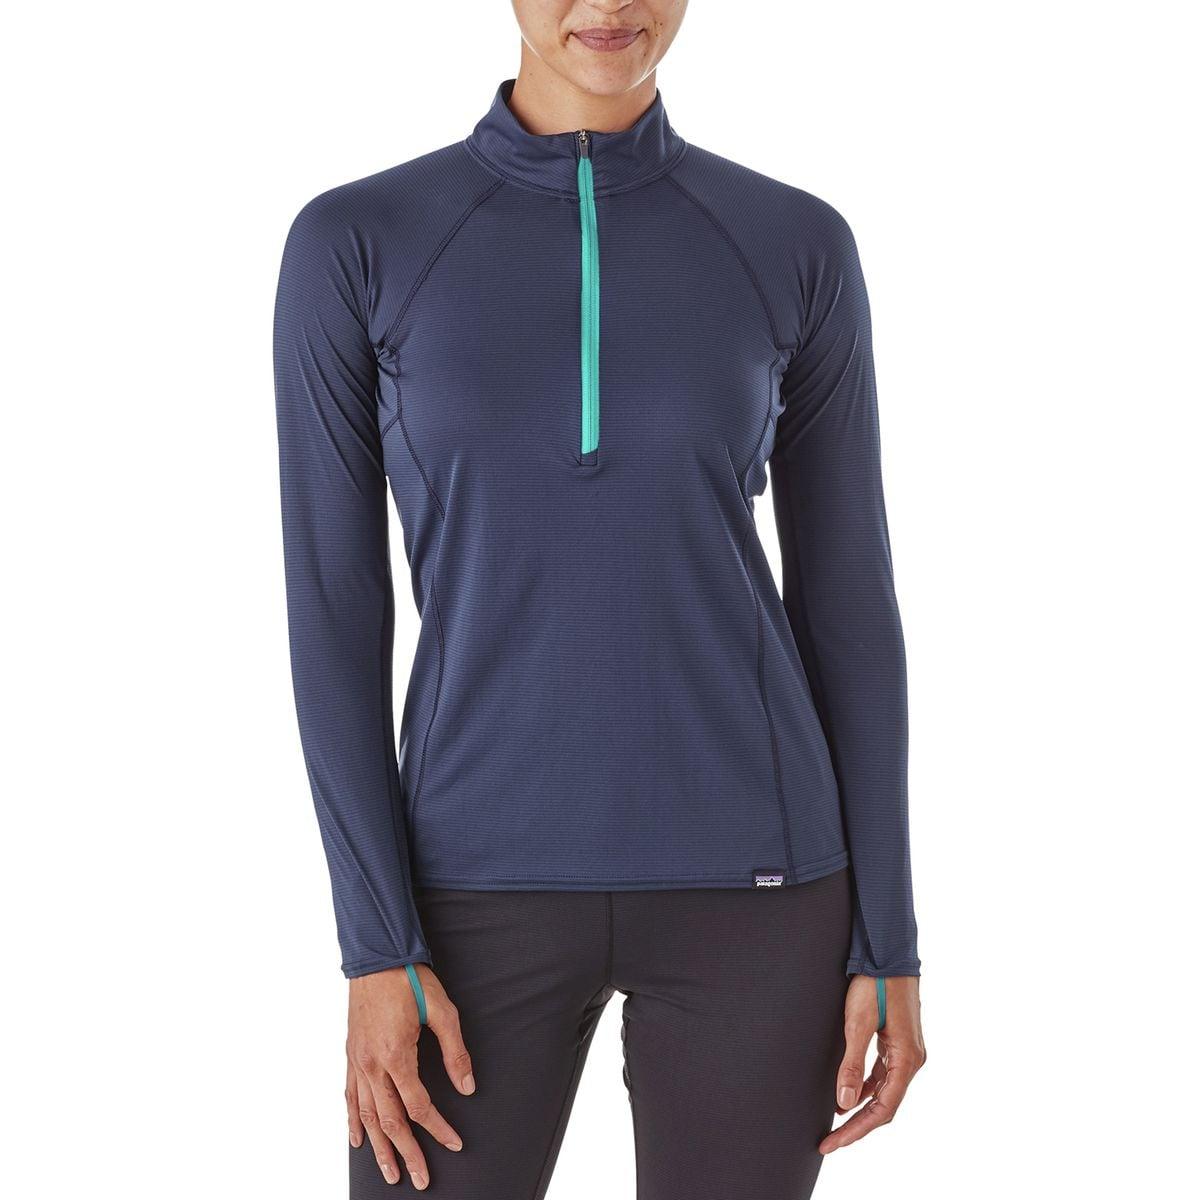 Patagonia Capilene Lightweight Zip-Neck Shirt - Women